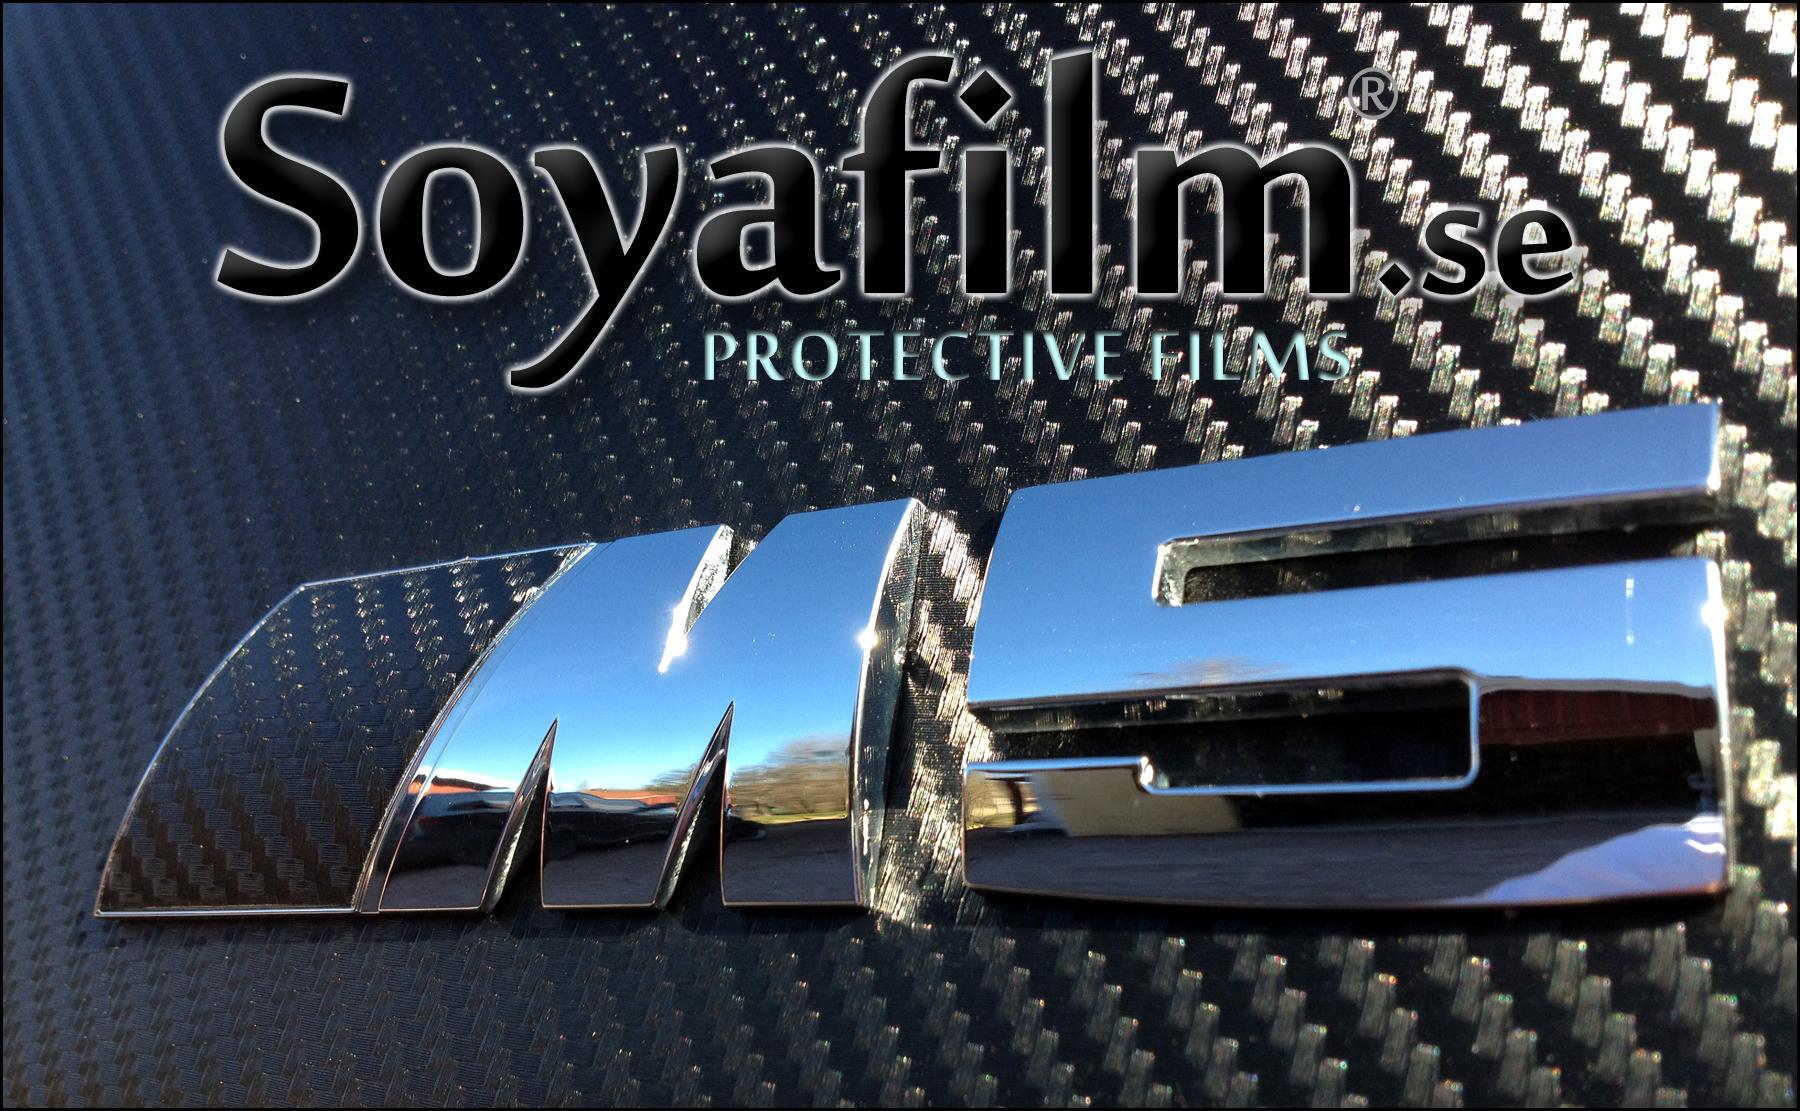 soyafilm-se-carbon-vinyl-kolfibervinyl-kolfiberfilm-bmw-e60-M5-wrapping-solfilm-stenskottsfilm-lackskydsfilm